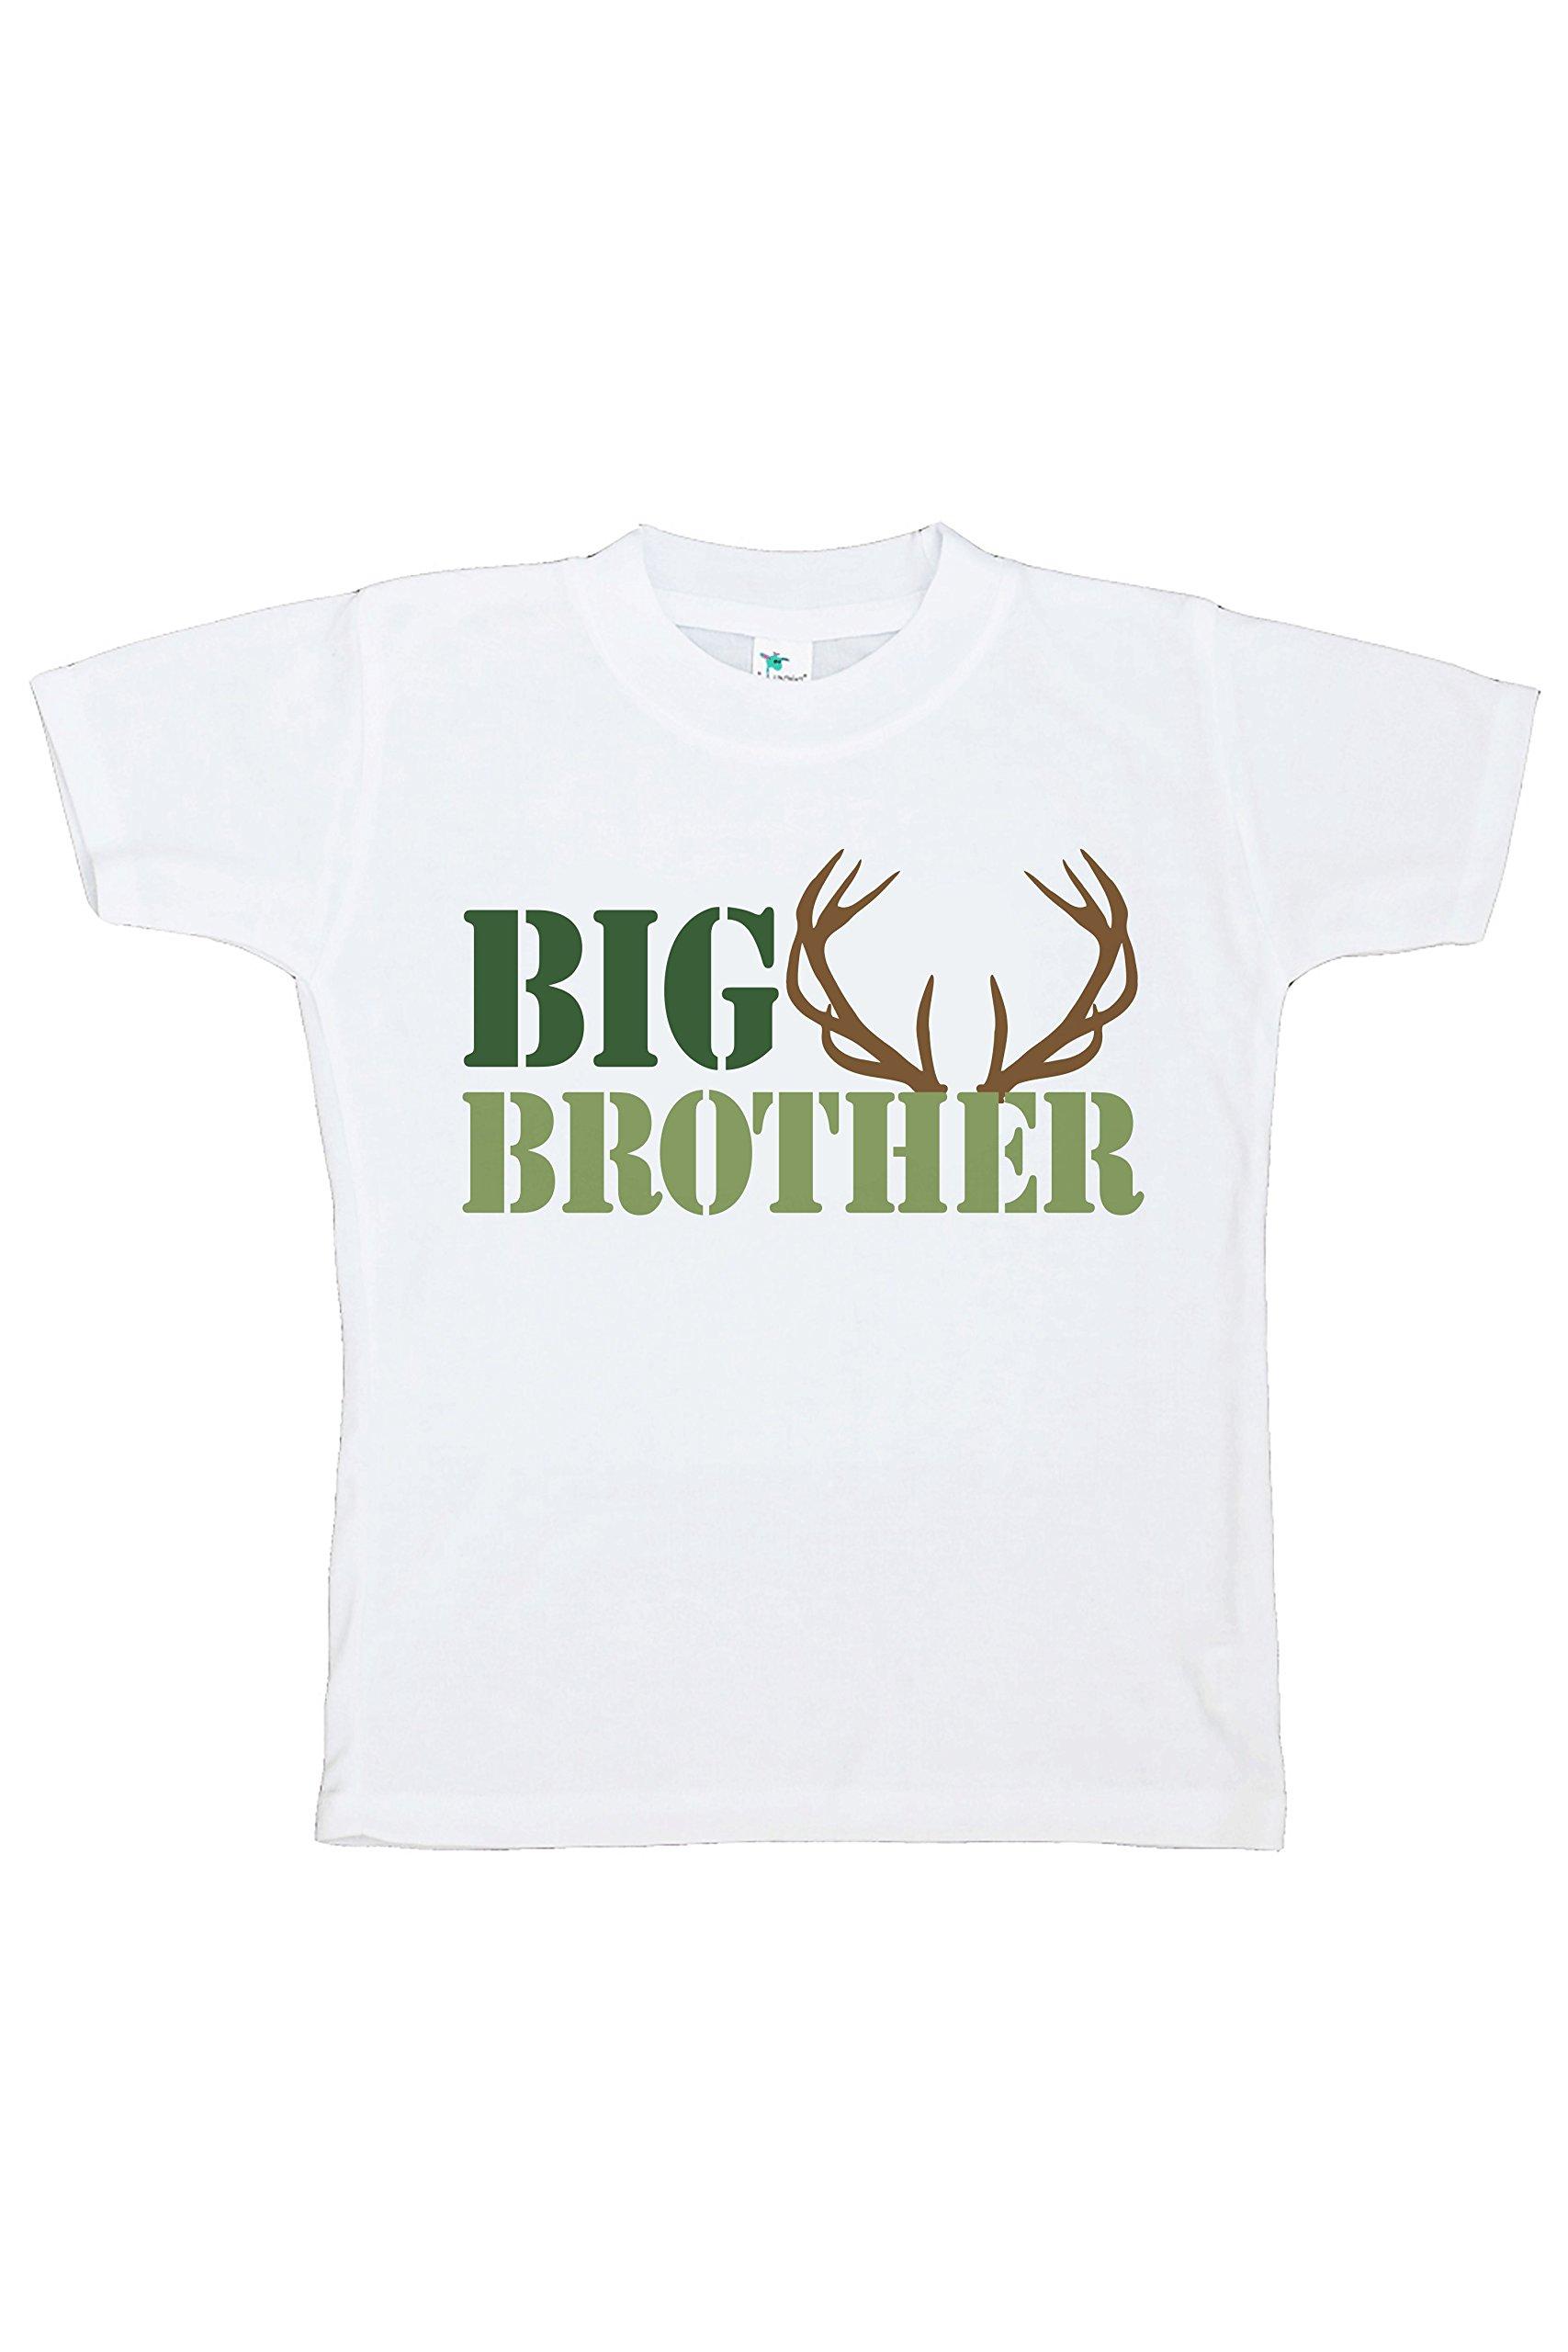 7 ate 9 Apparel Boy's Hunting Big Brother T-Shirt